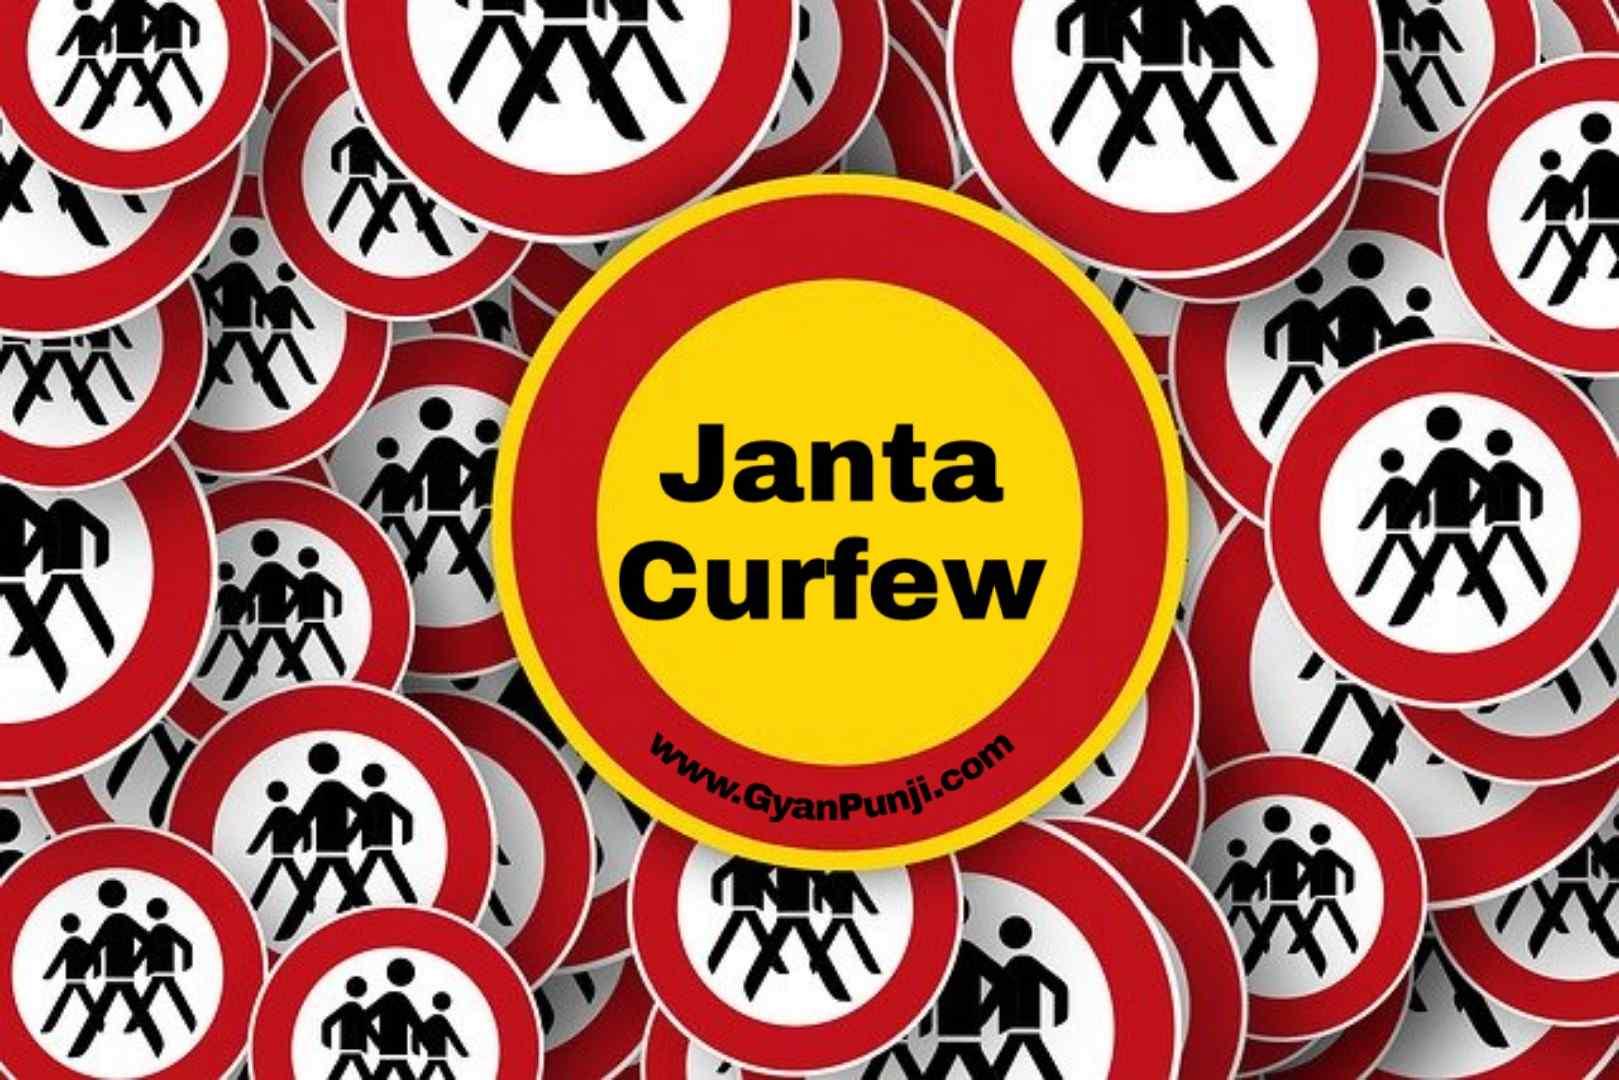 janta curfew